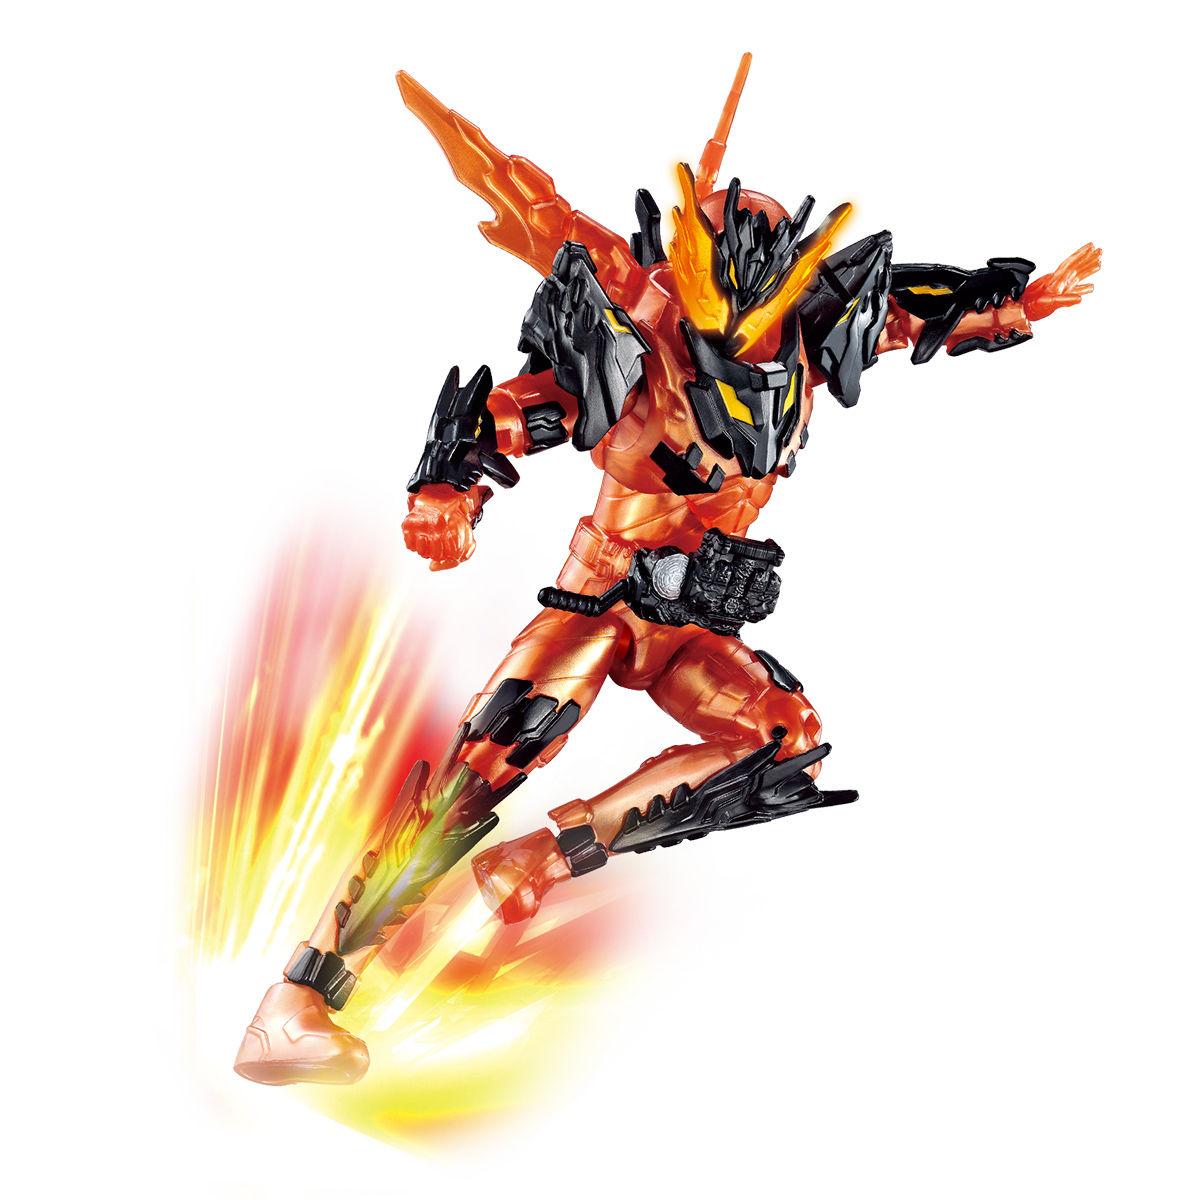 RKFレジェンドライダーシリーズ『仮面ライダークローズマグマ』可動フィギュア-005